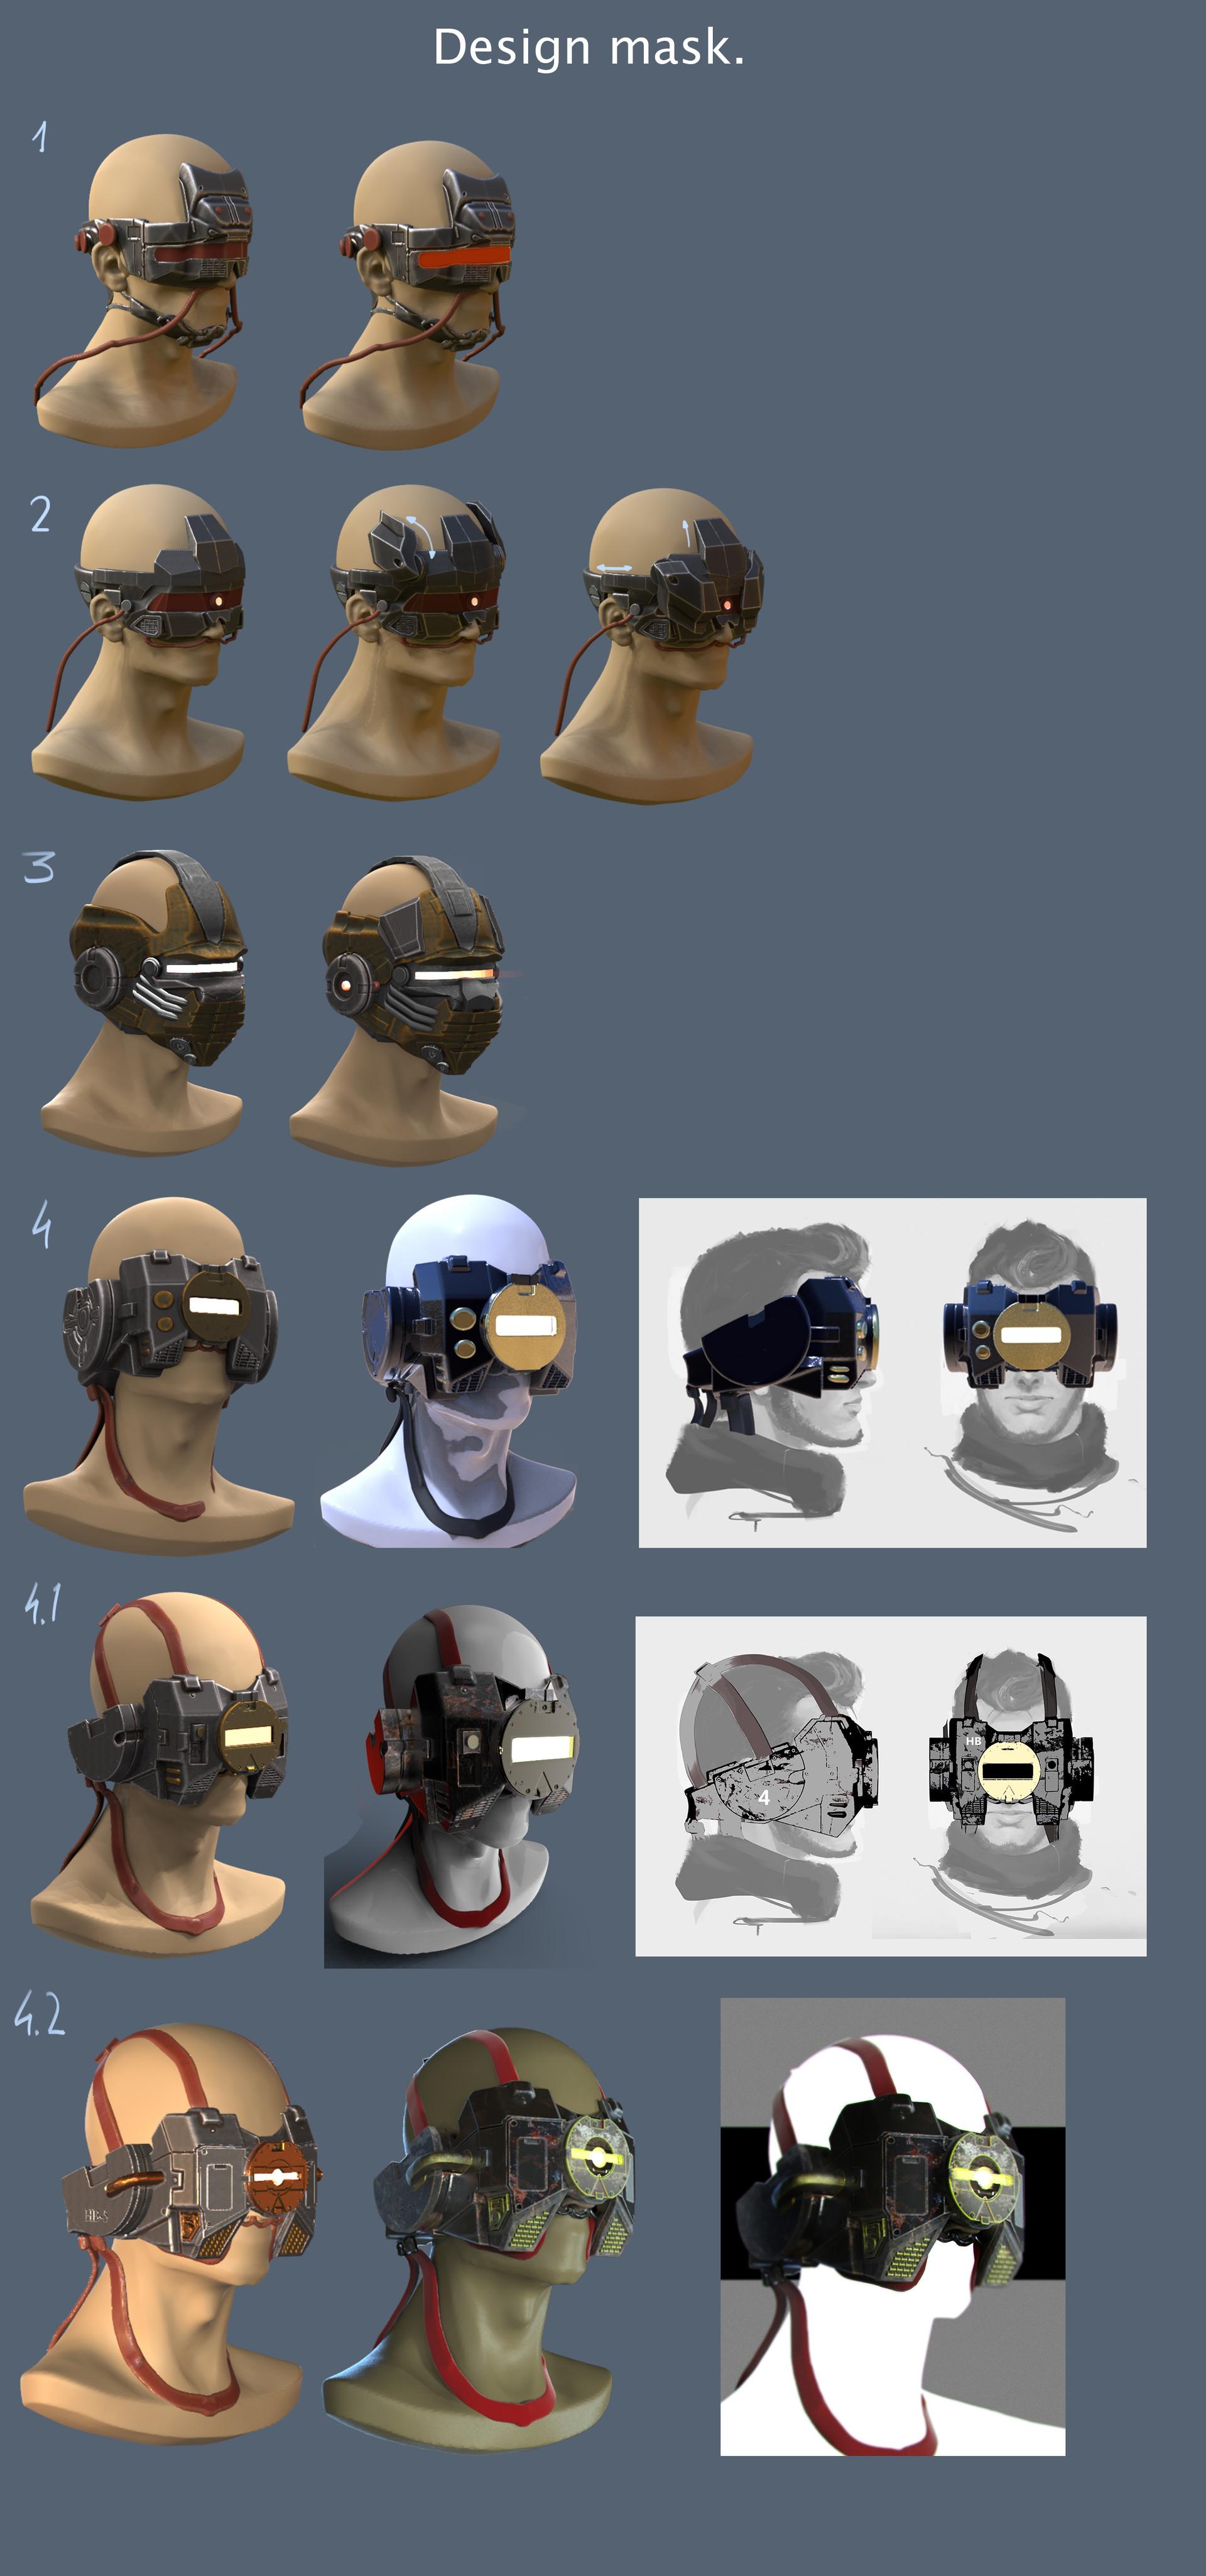 Alexandr iwaac mask design